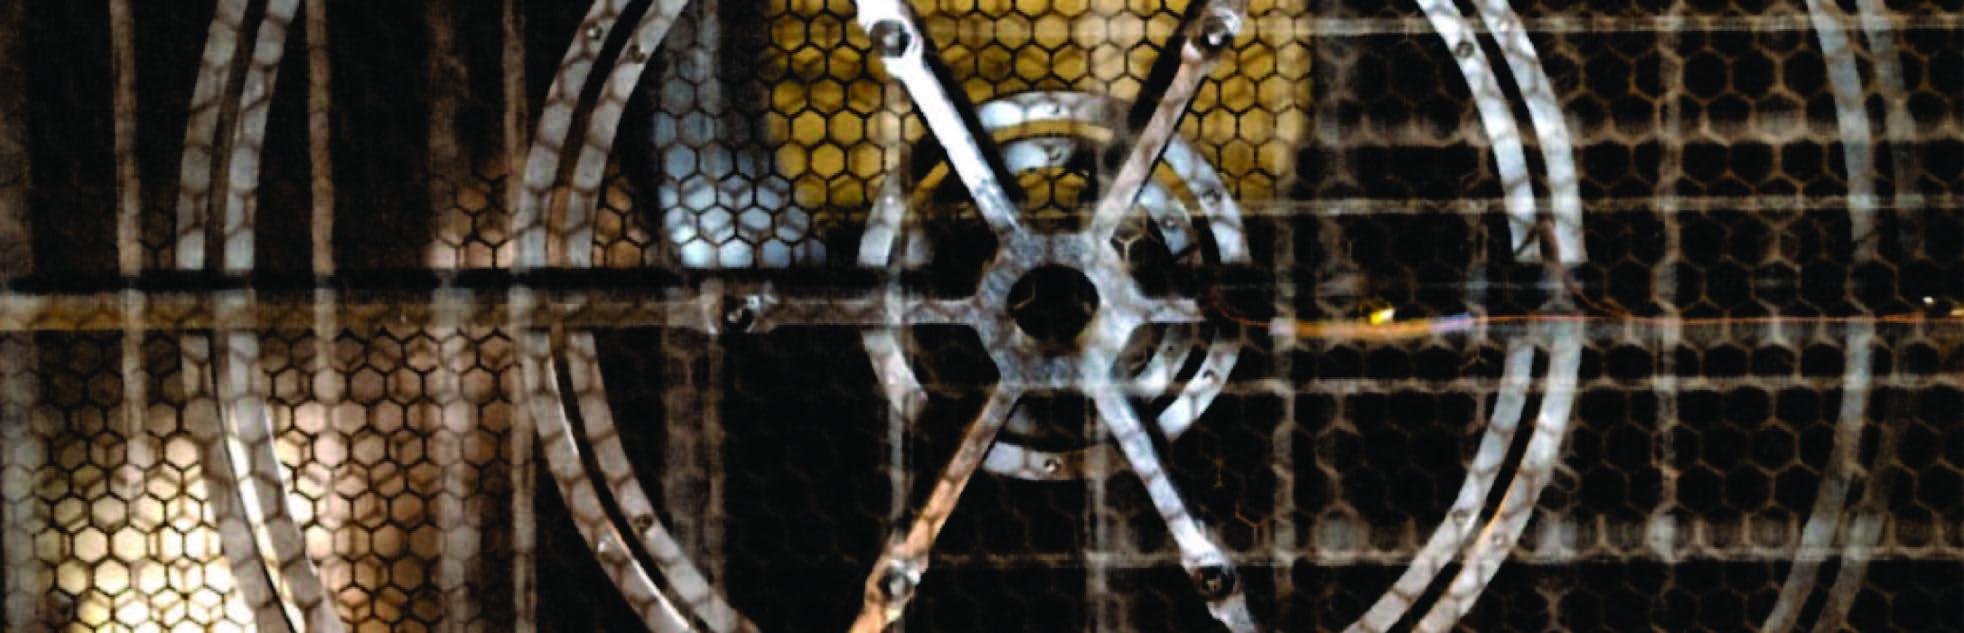 Photo of hyperdust prototype